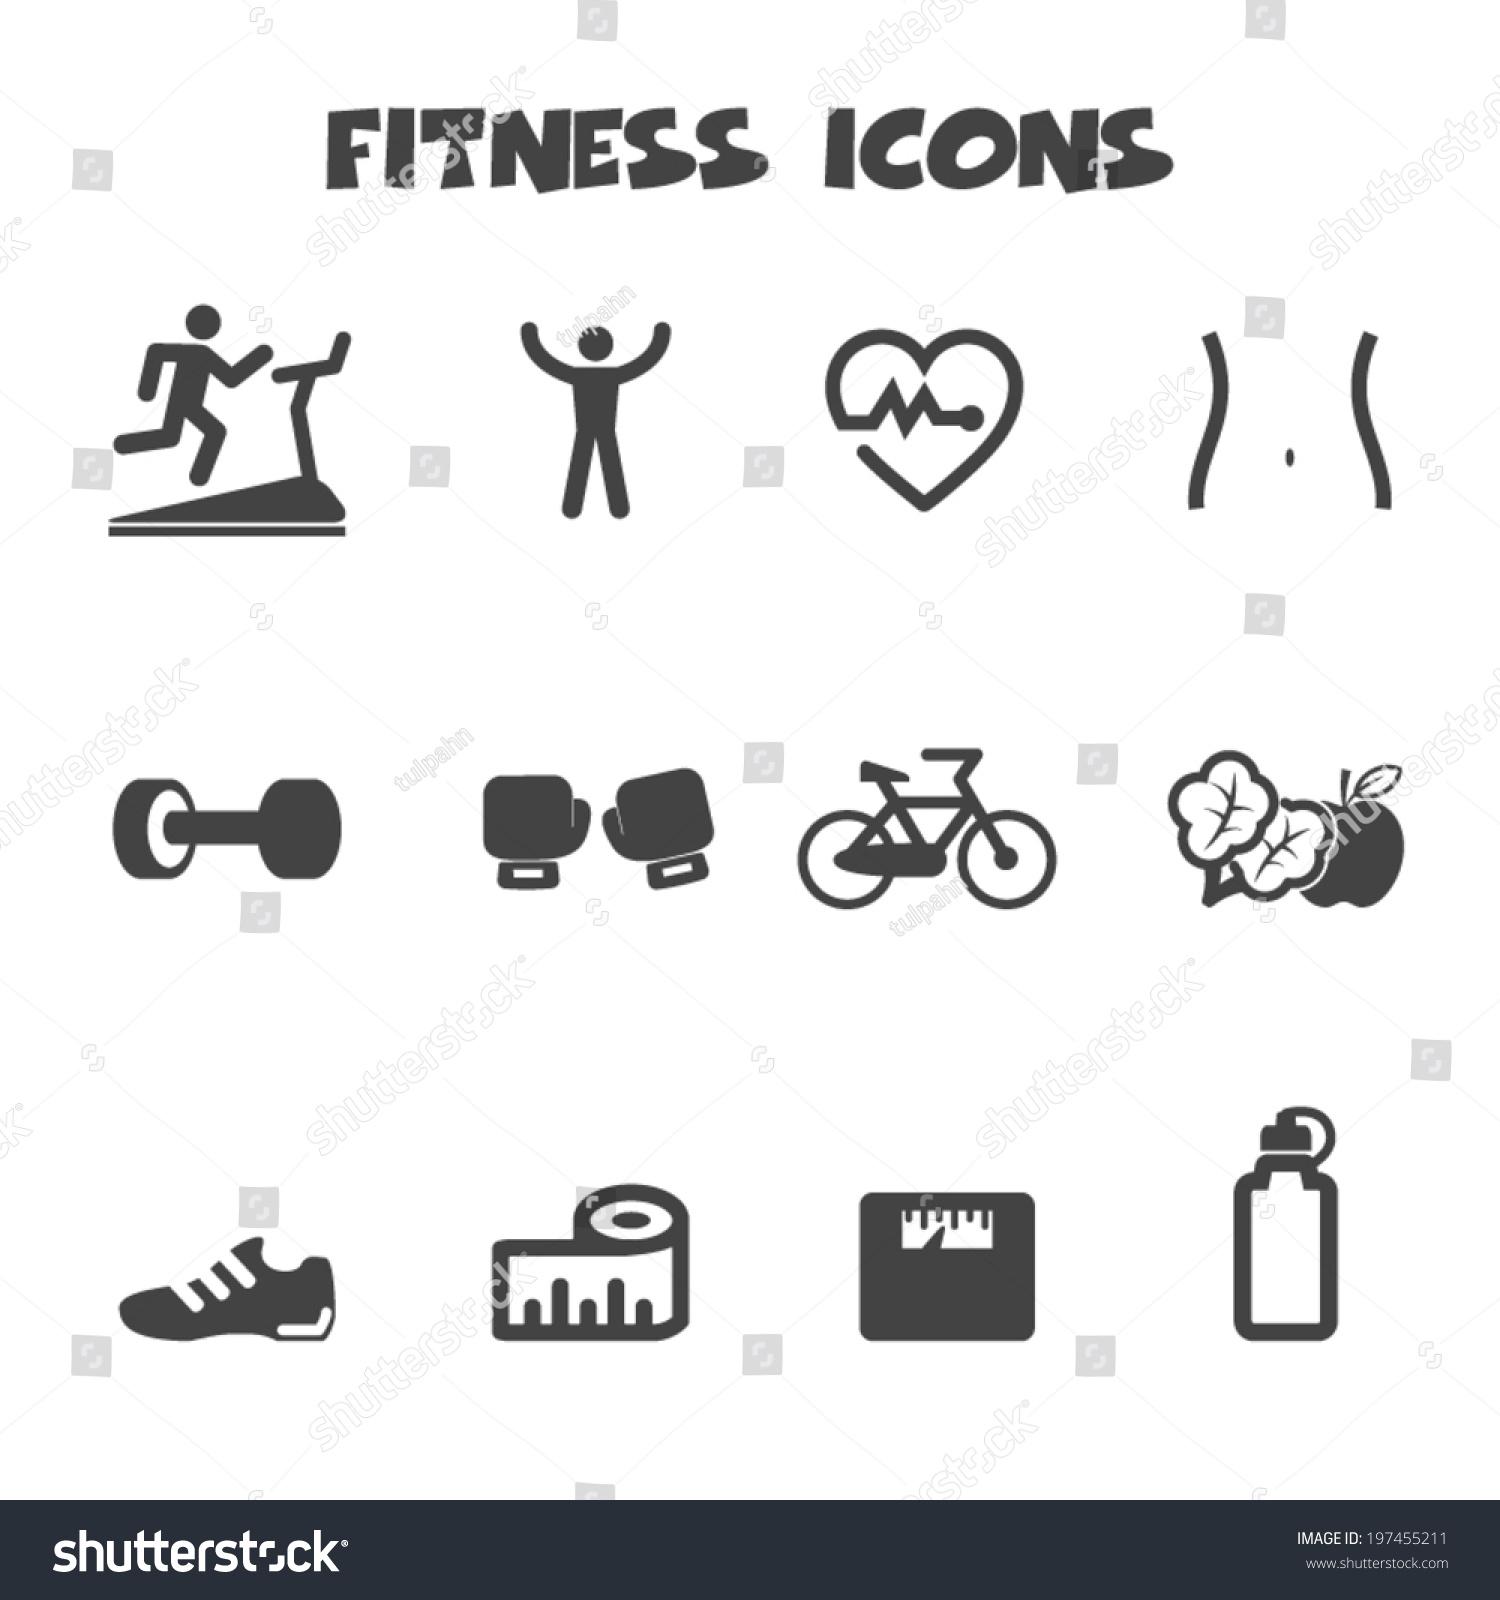 Fitness Icons, Mono Vector Symbols - 197455211 : Shutterstock